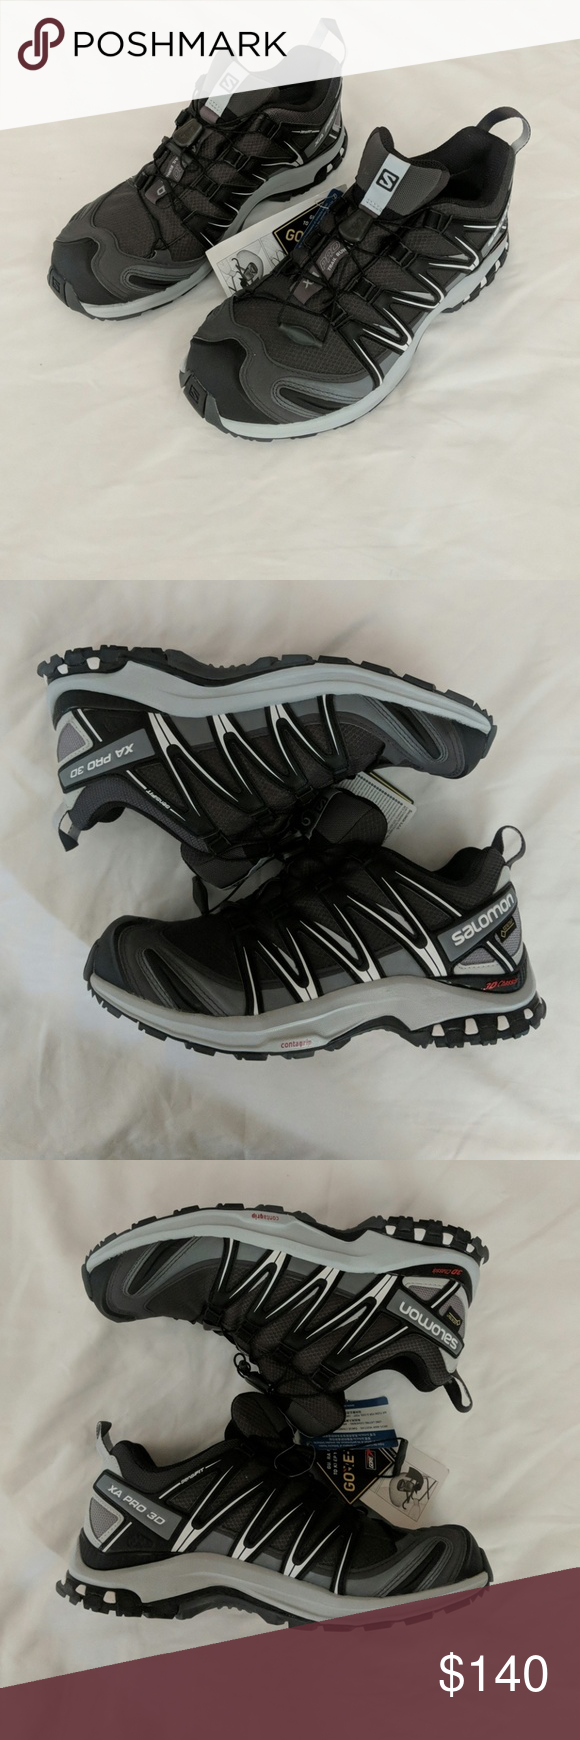 Salomon Xa Pro 3d Gore Tex Trail Running Shoes Trail Running Shoes Running Shoes Shoes